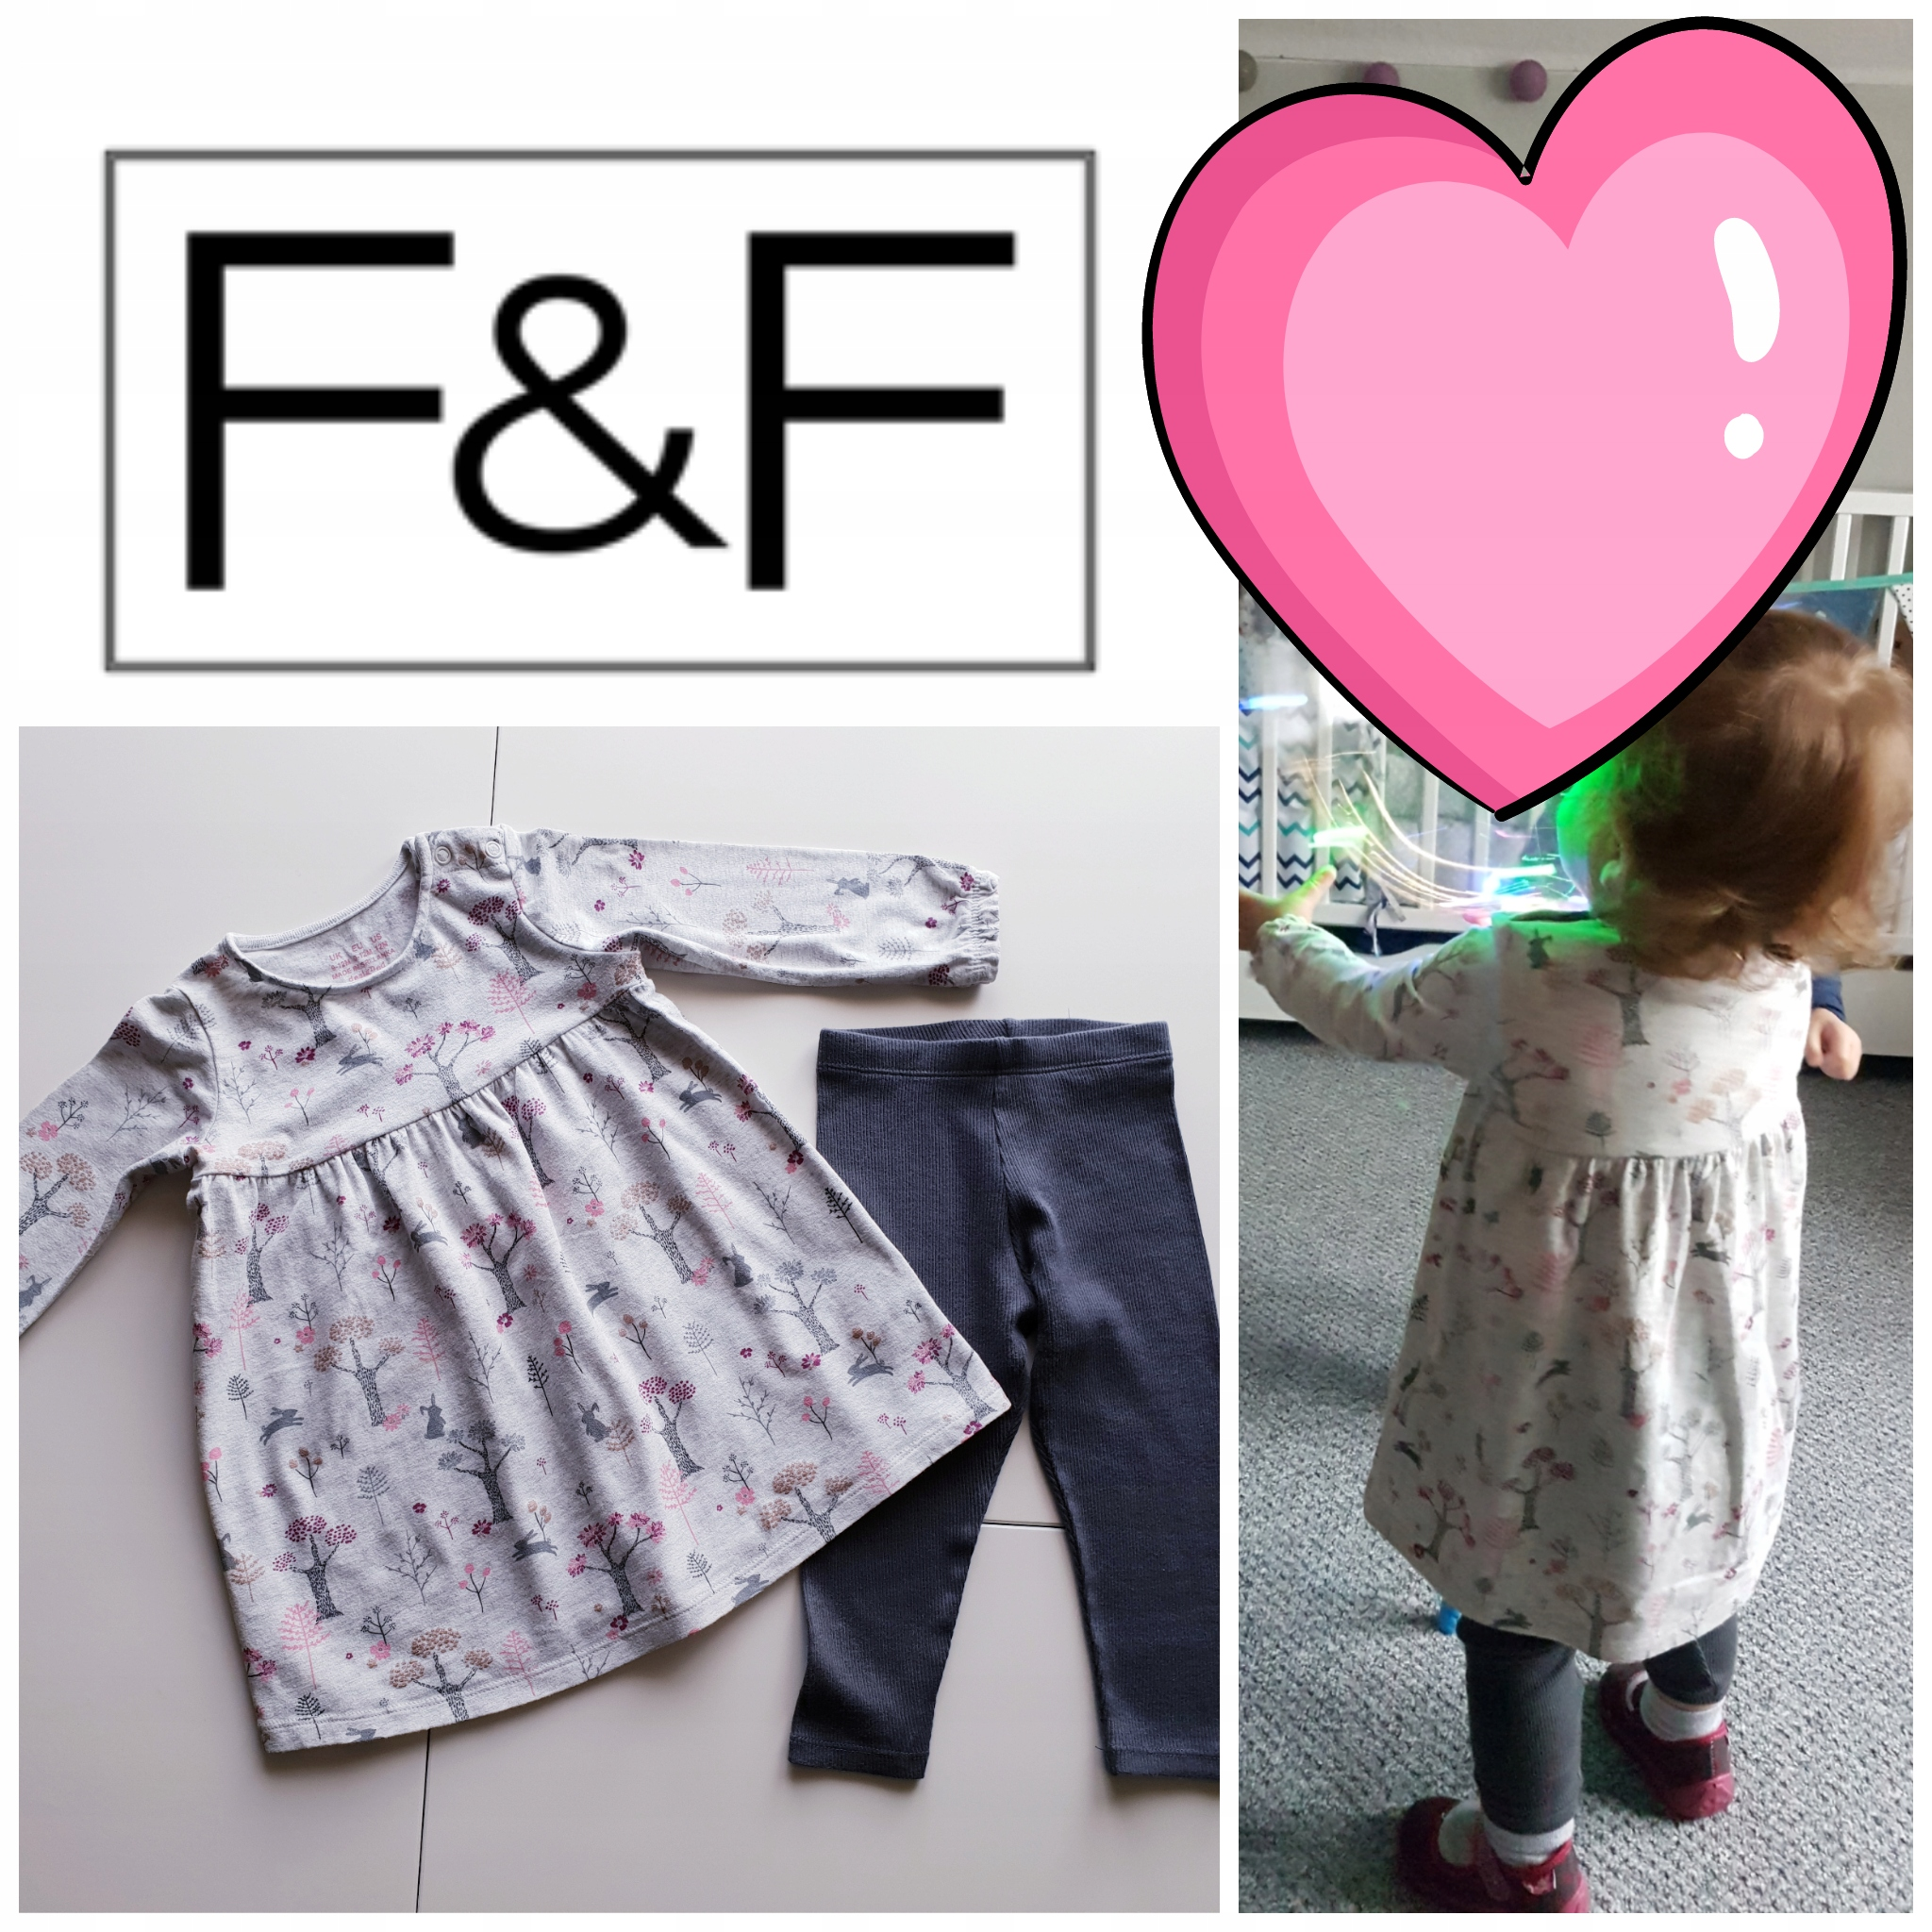 F&F śliczny komplet sukienka+legi, 9-12m, 80